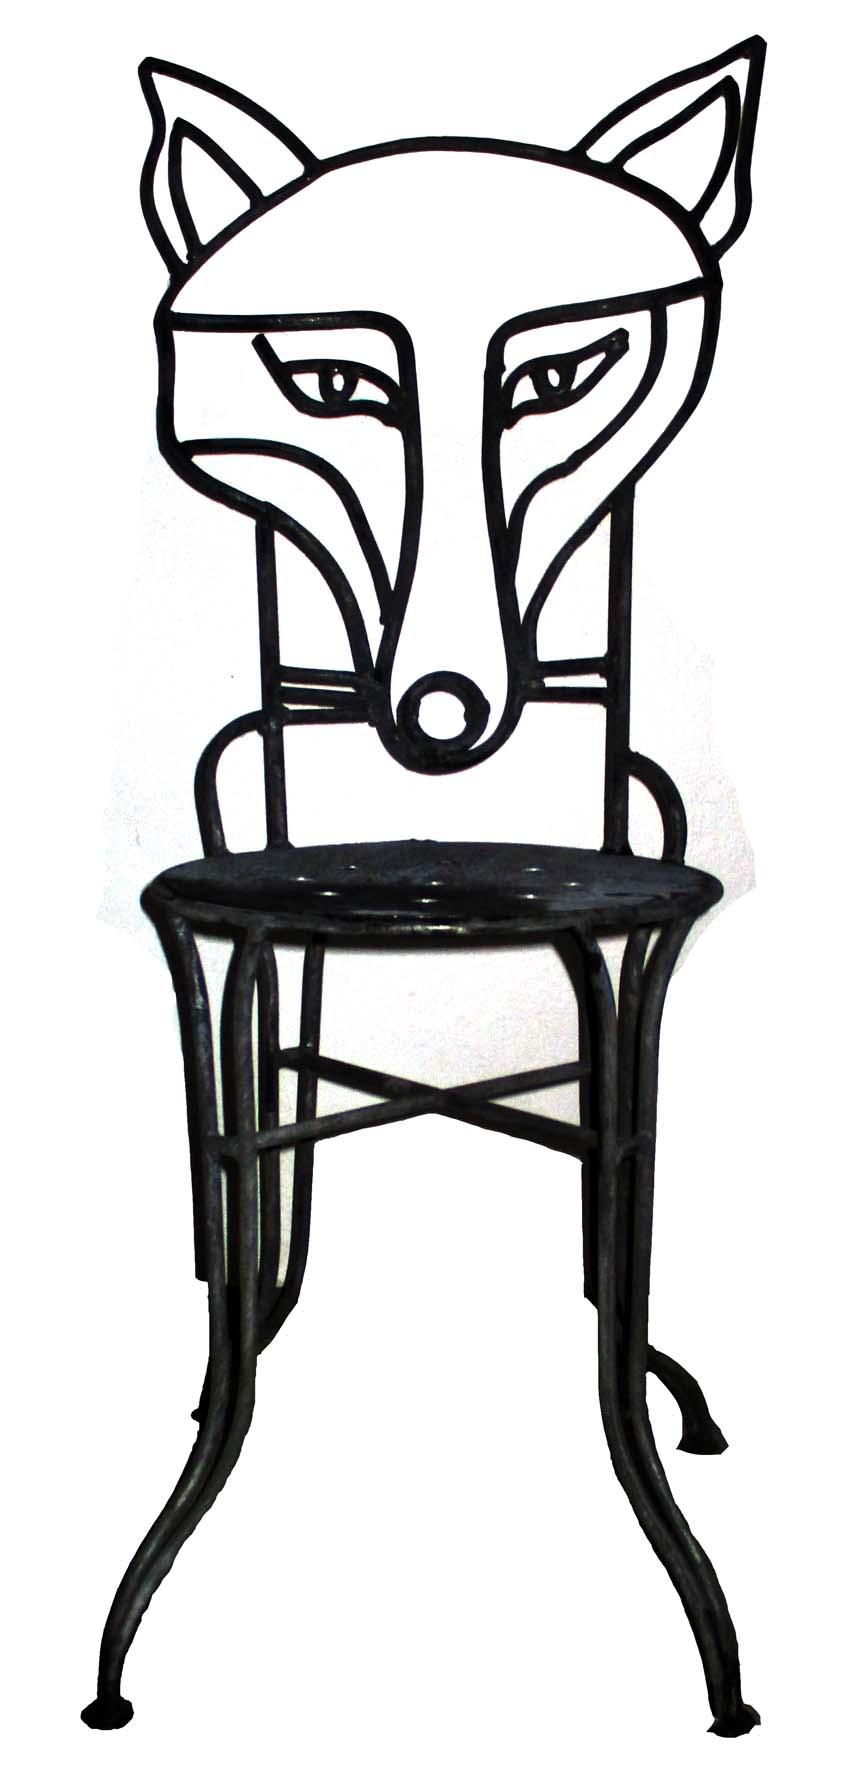 83_email-wwwfox-chair.jpg